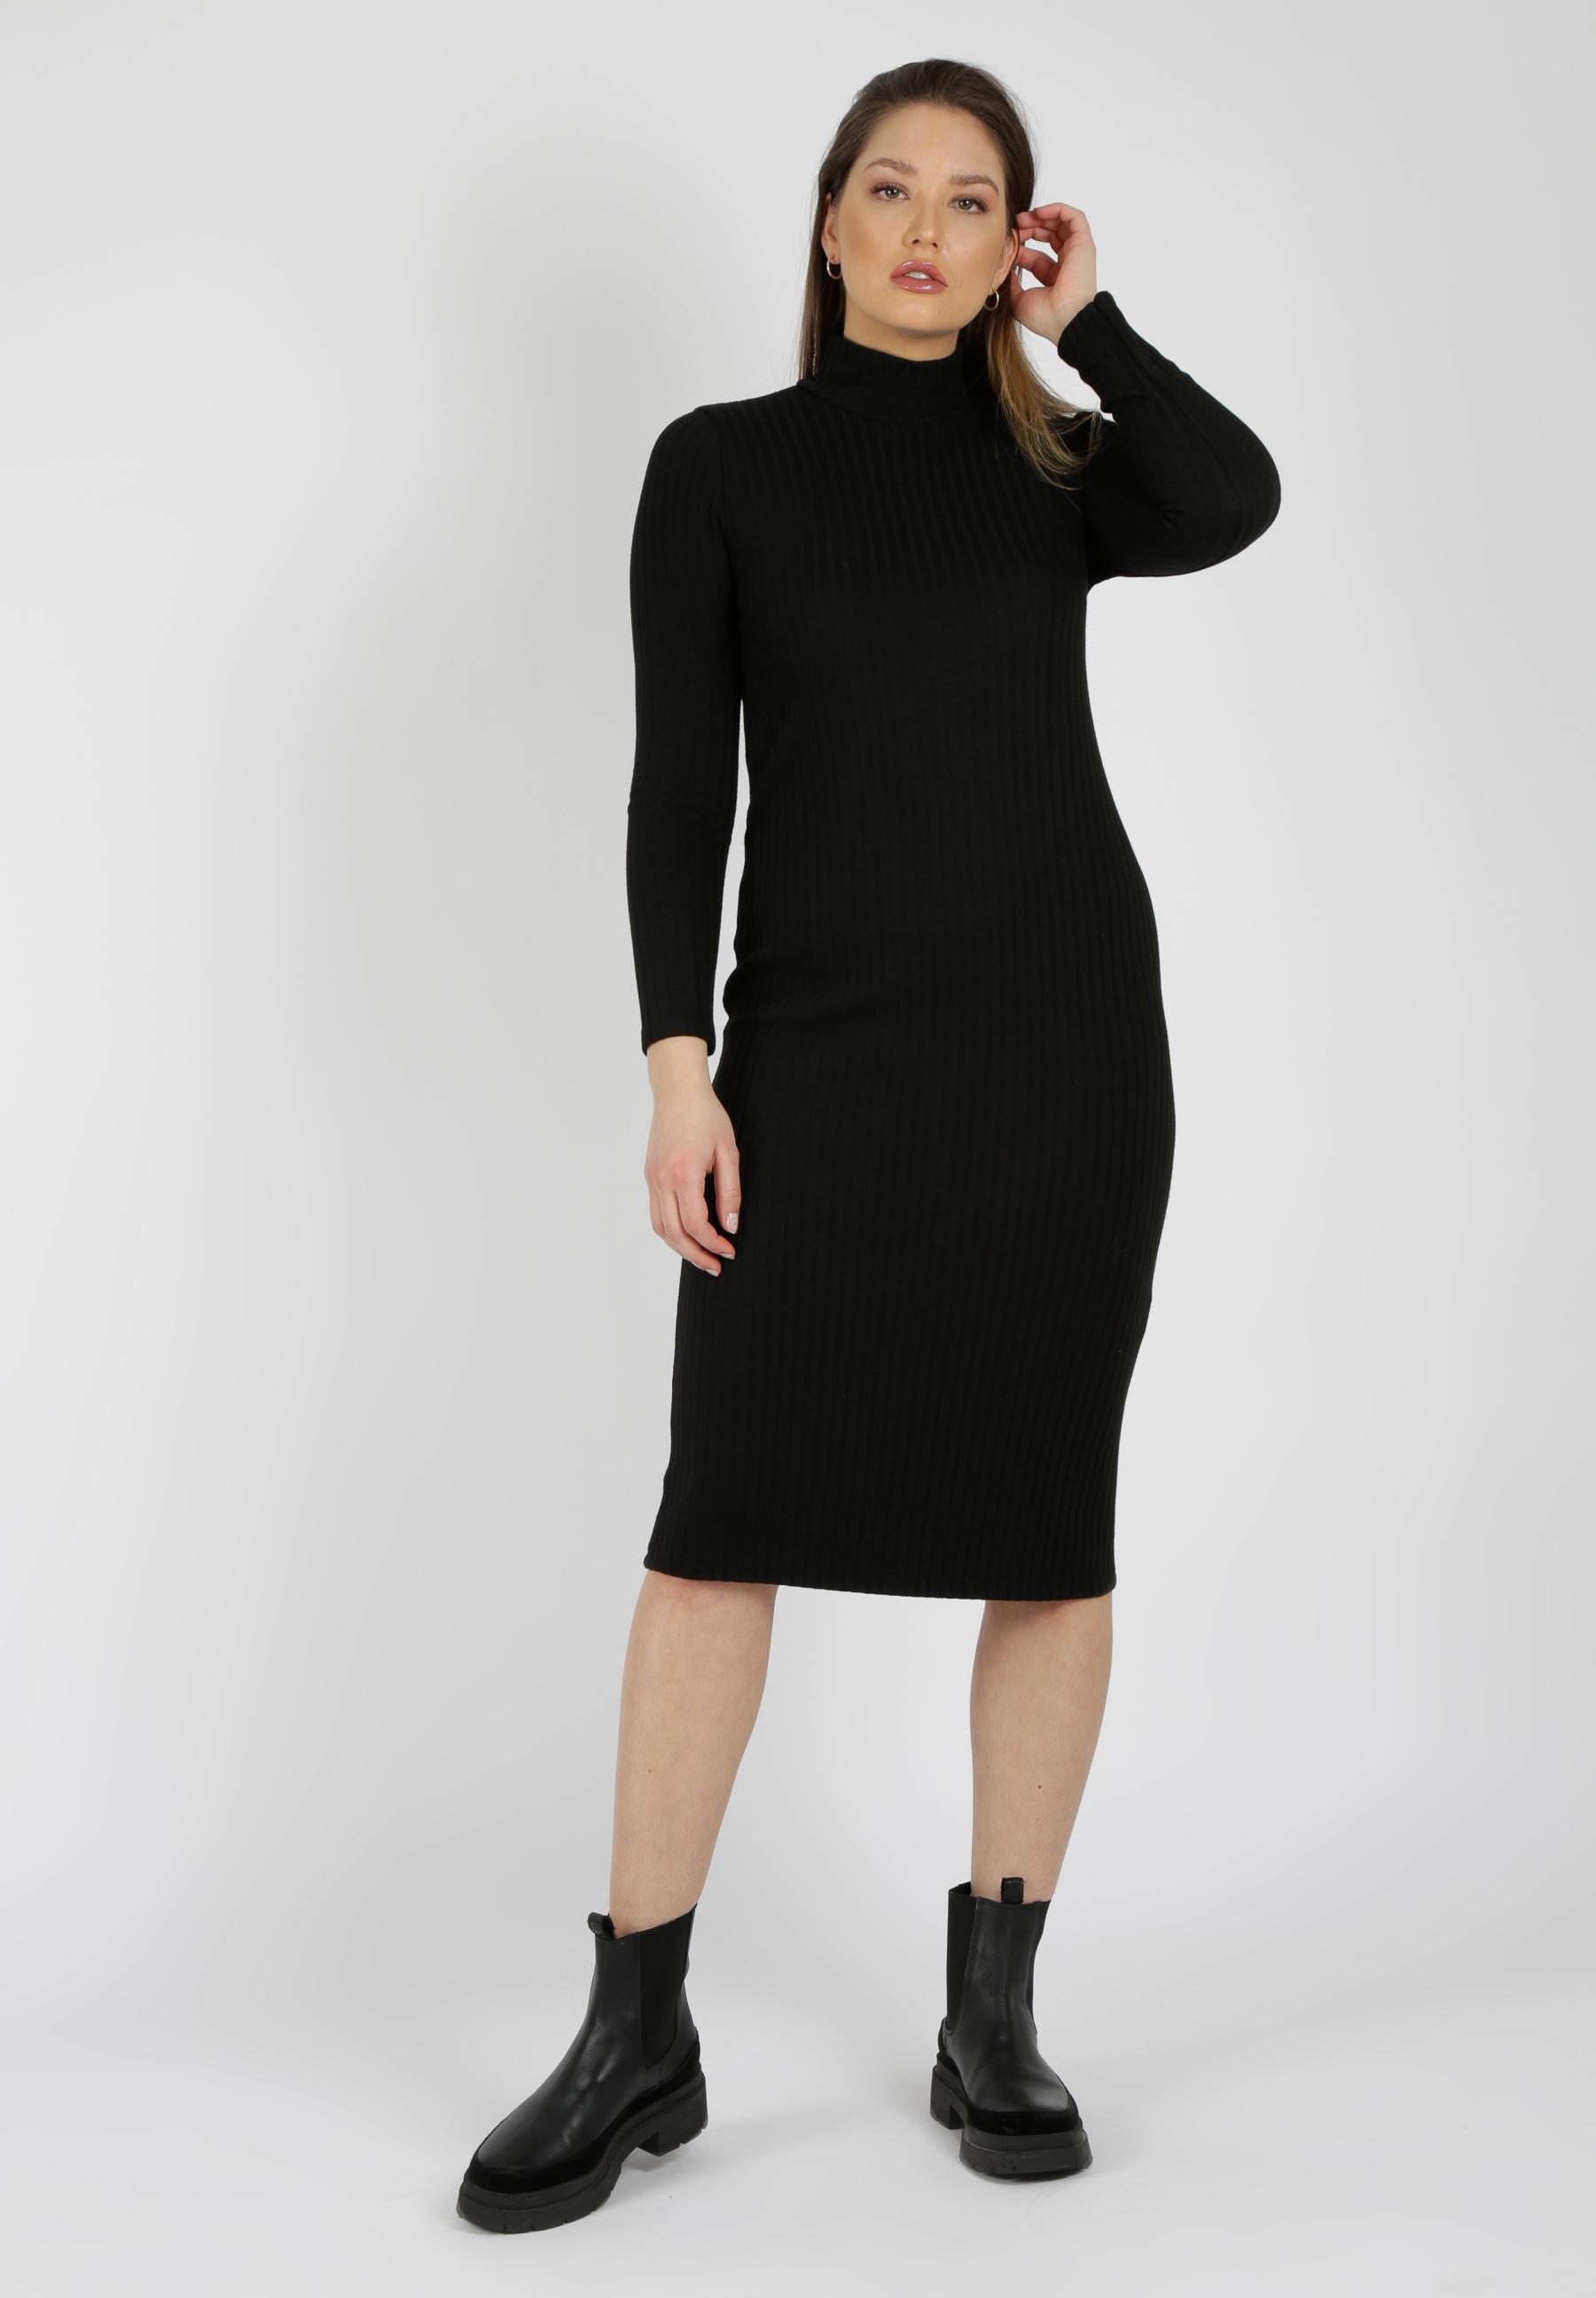 MiaZAYA Rollkragen Kleid